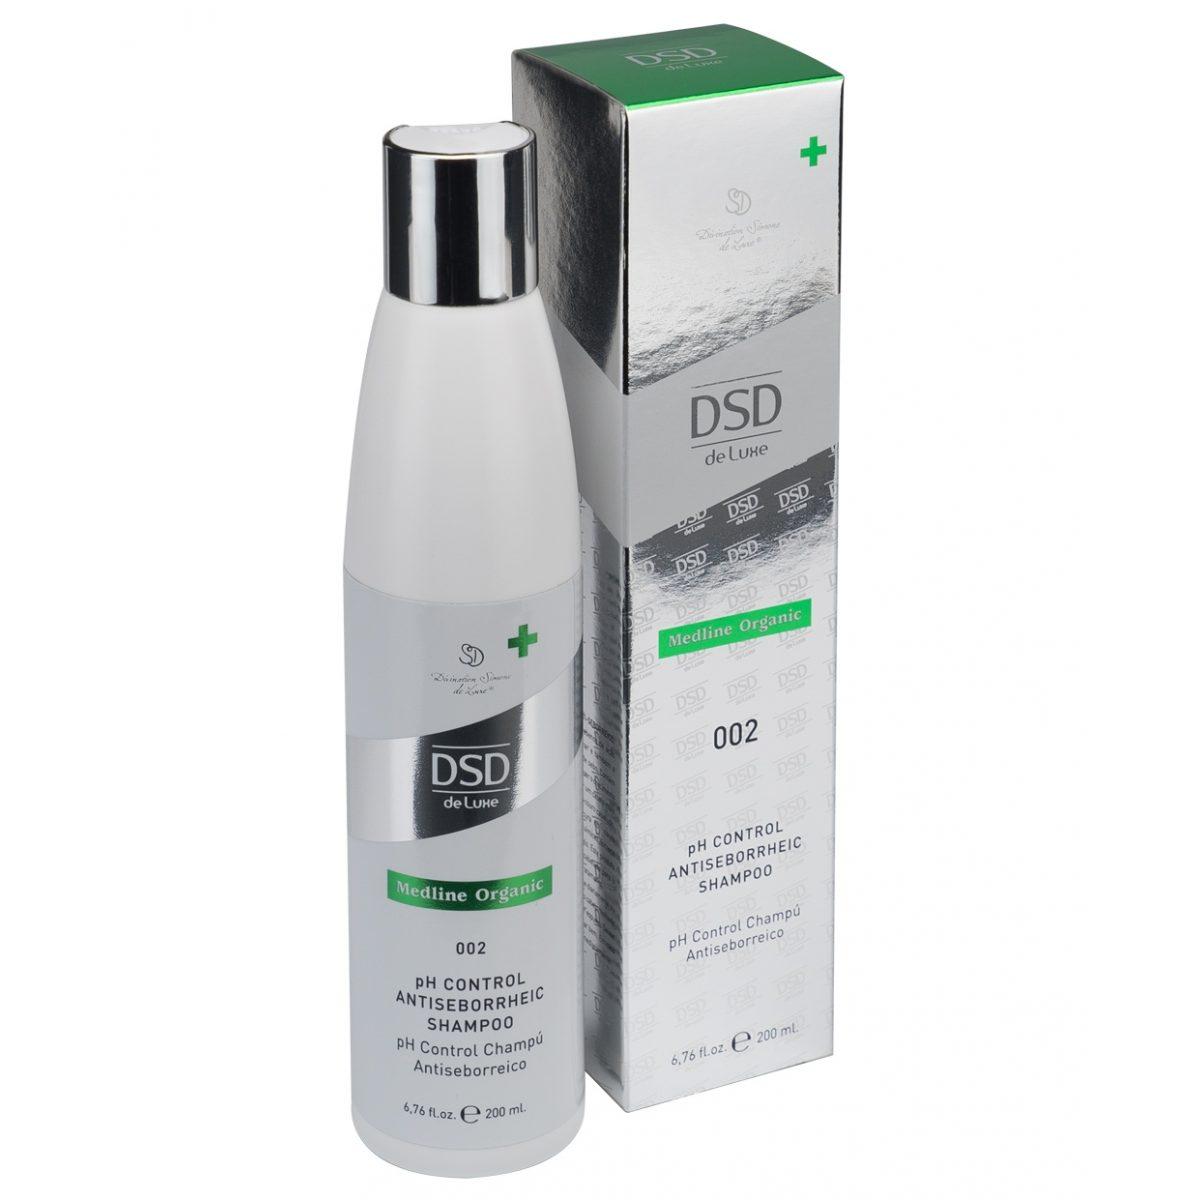 DSD DE LUXE 002 pH control antiseborrheic shampoo